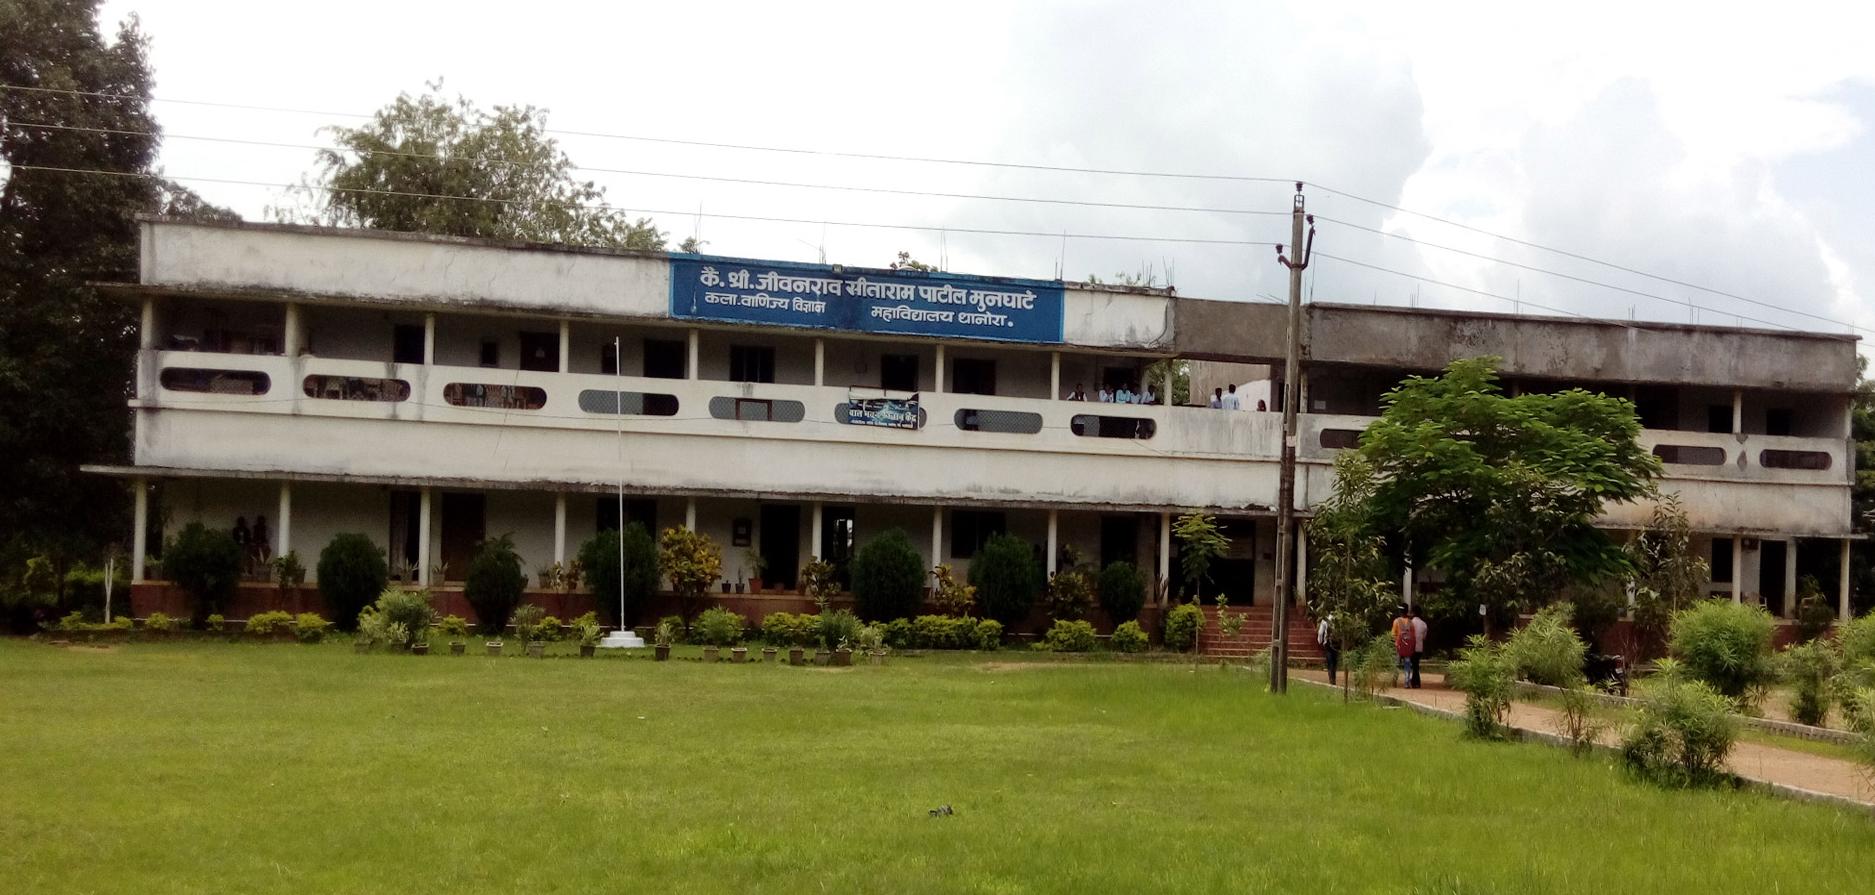 Shri Jivanrao Sitaram Patil Munghute Arts Commerce, Gadchiroli